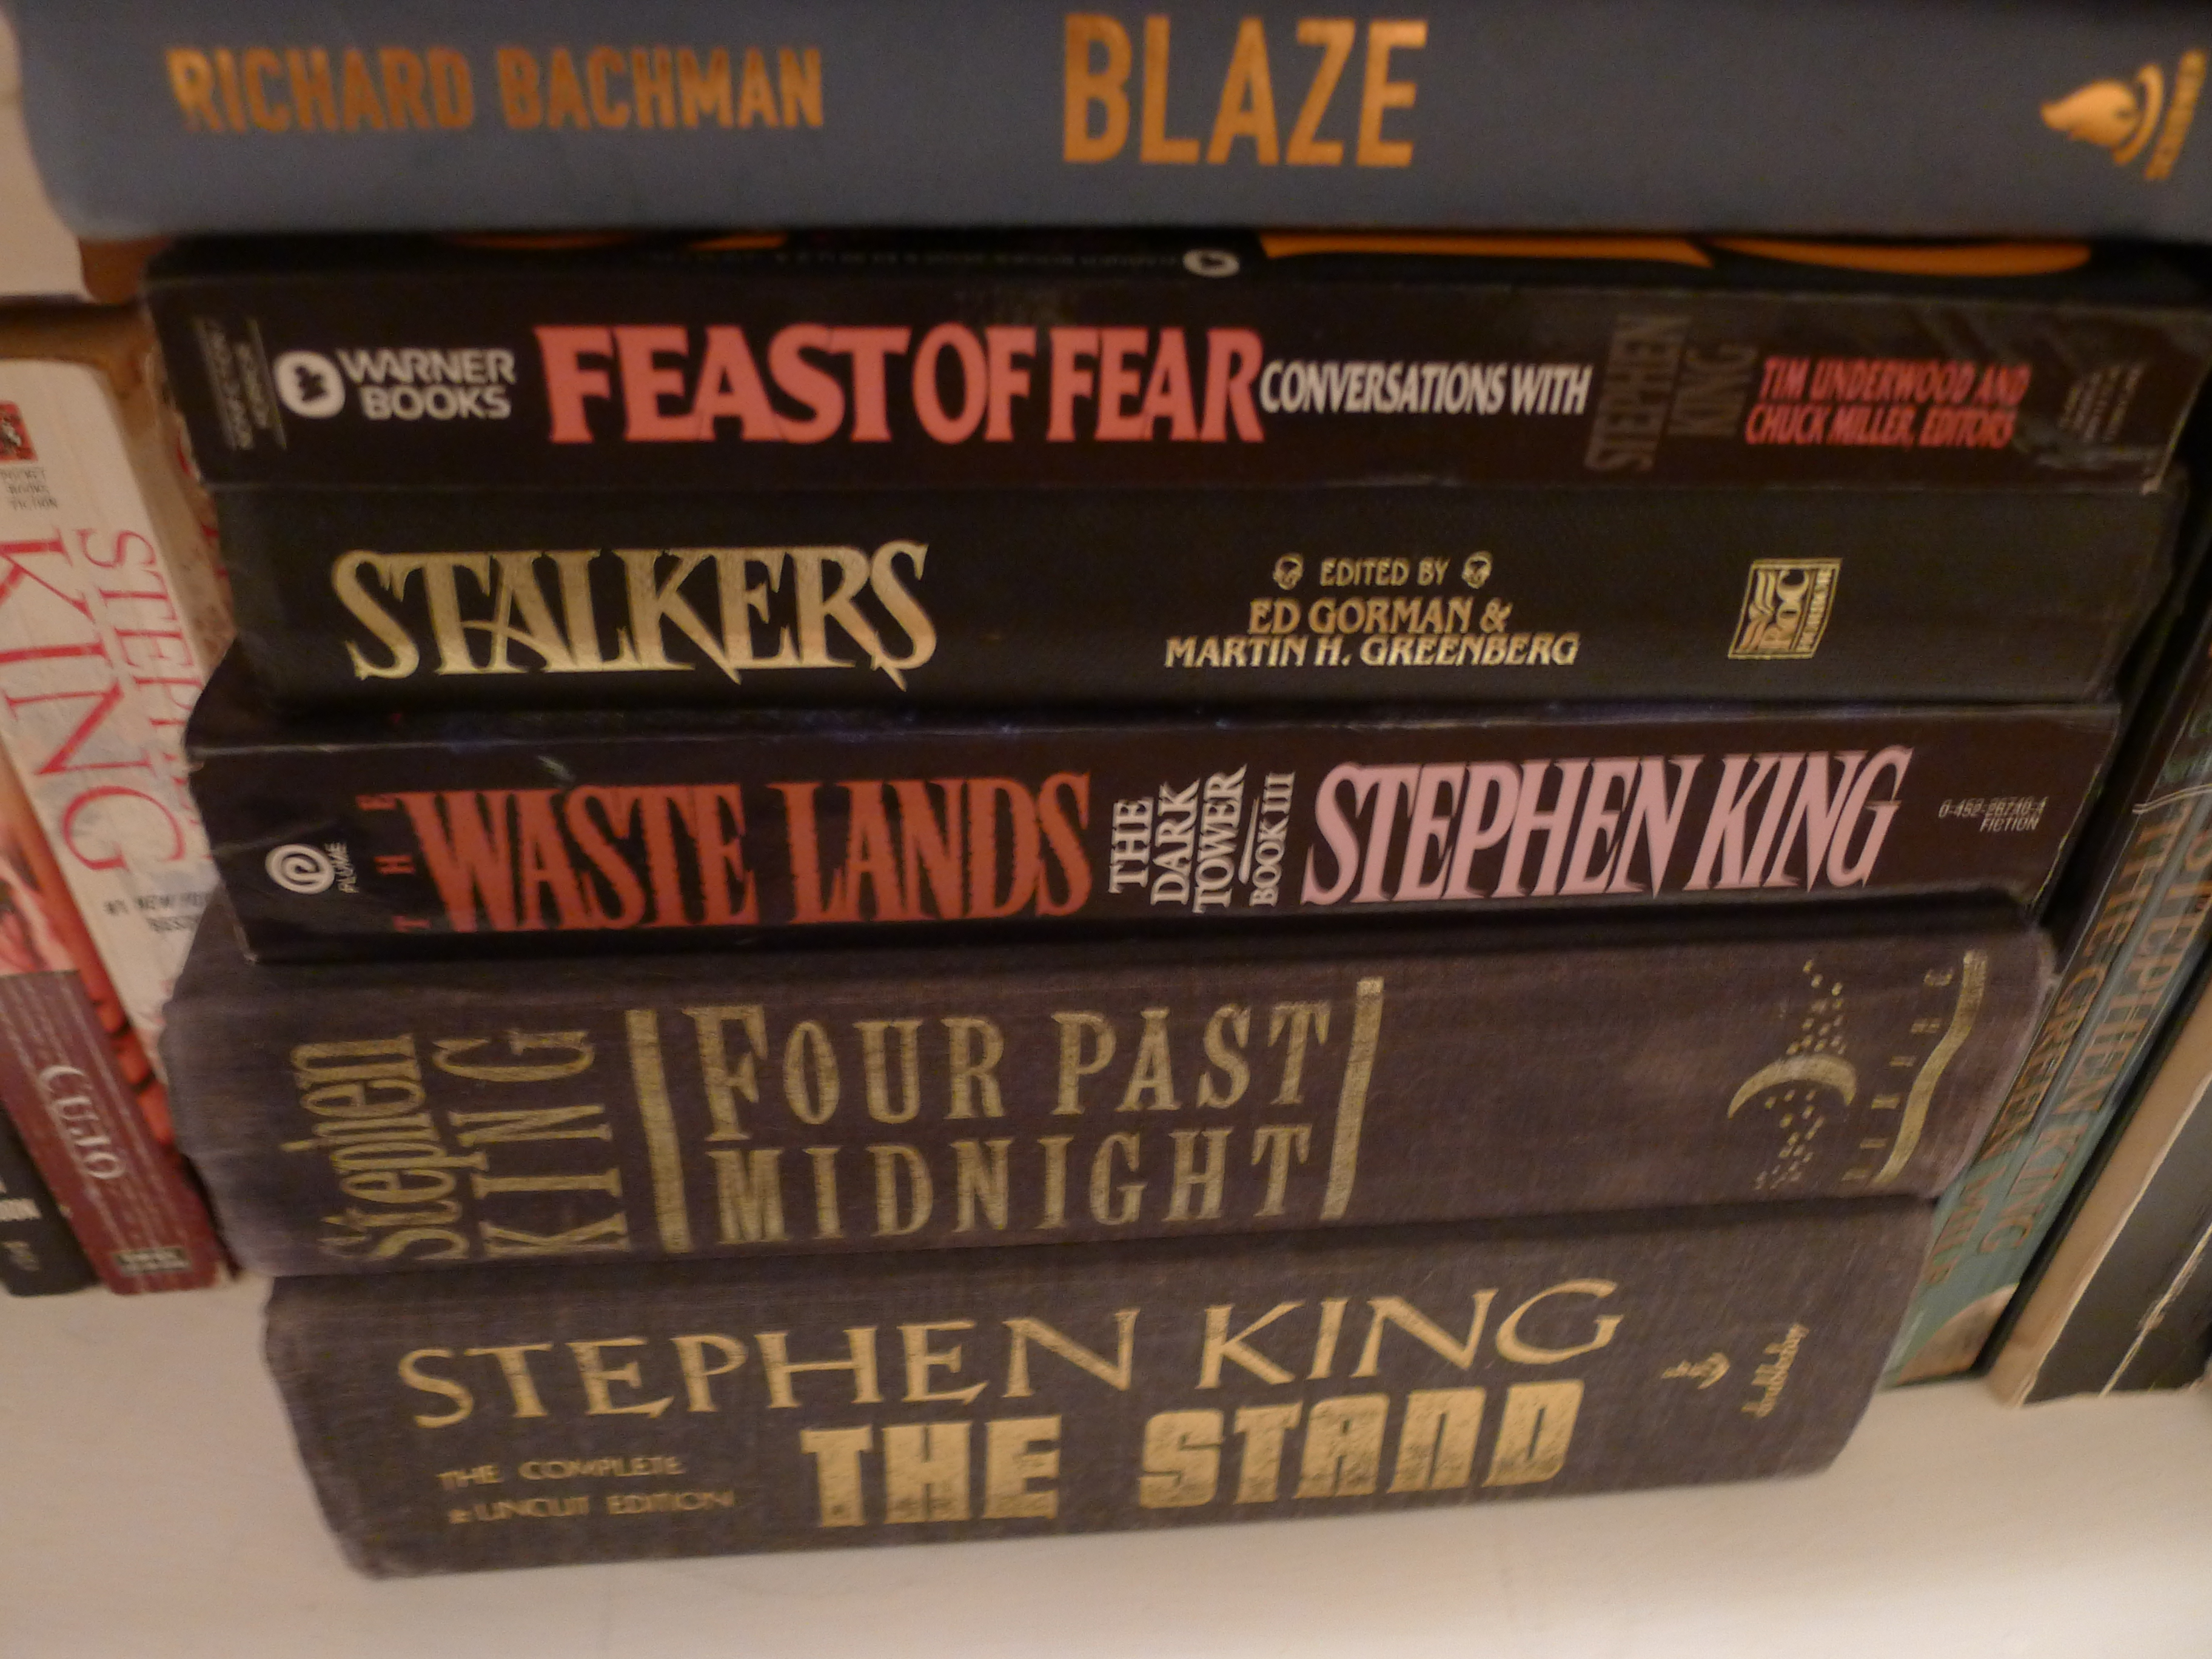 What makes a novel a classic?